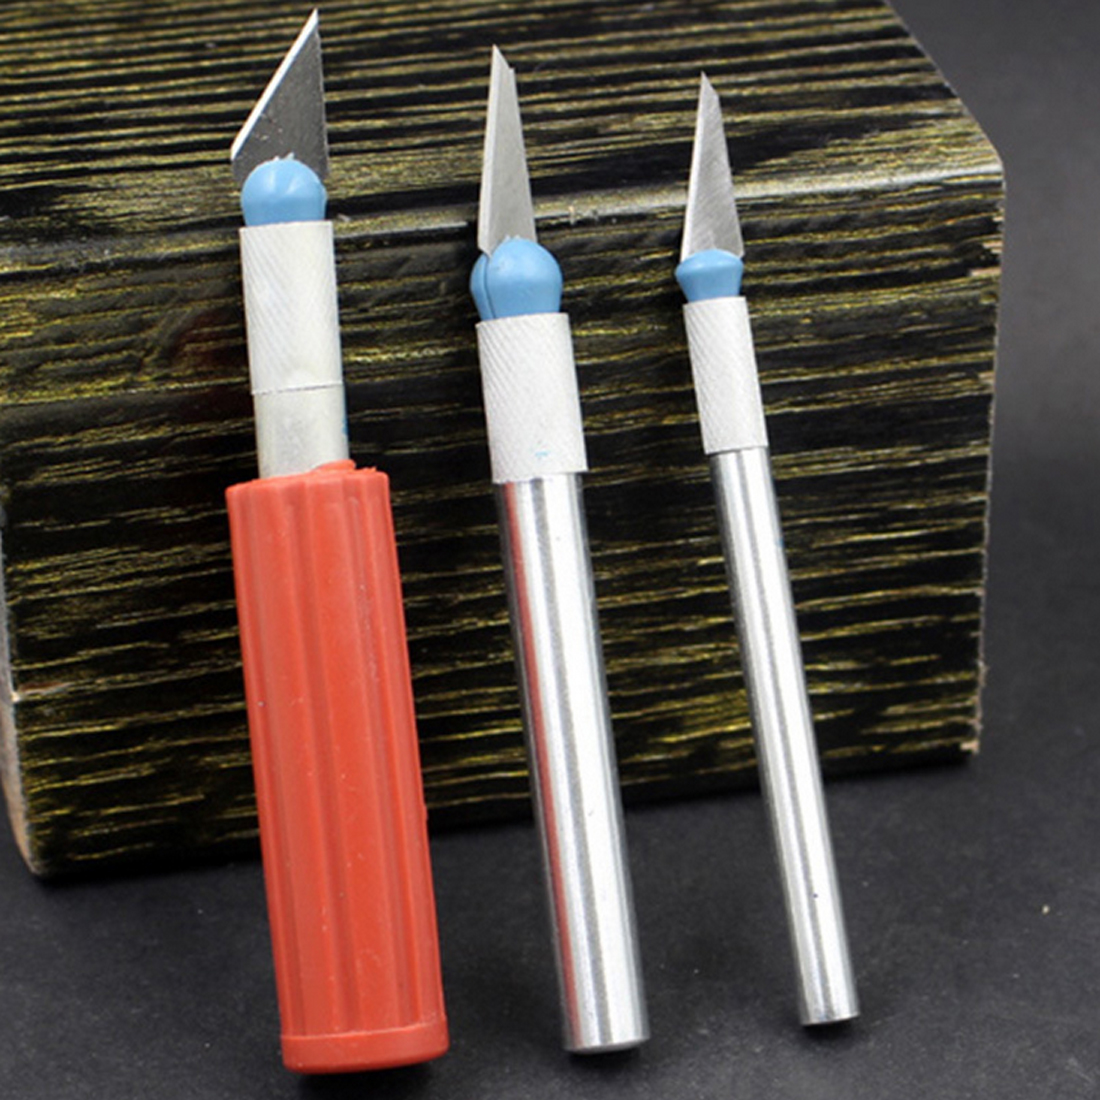 Купить с кэшбэком Wood Carving Hand Chisel Set Repair DIY Cutting Tool Craft Sculpture Engraving Scalpel Woodworking Carpenter Tools Set